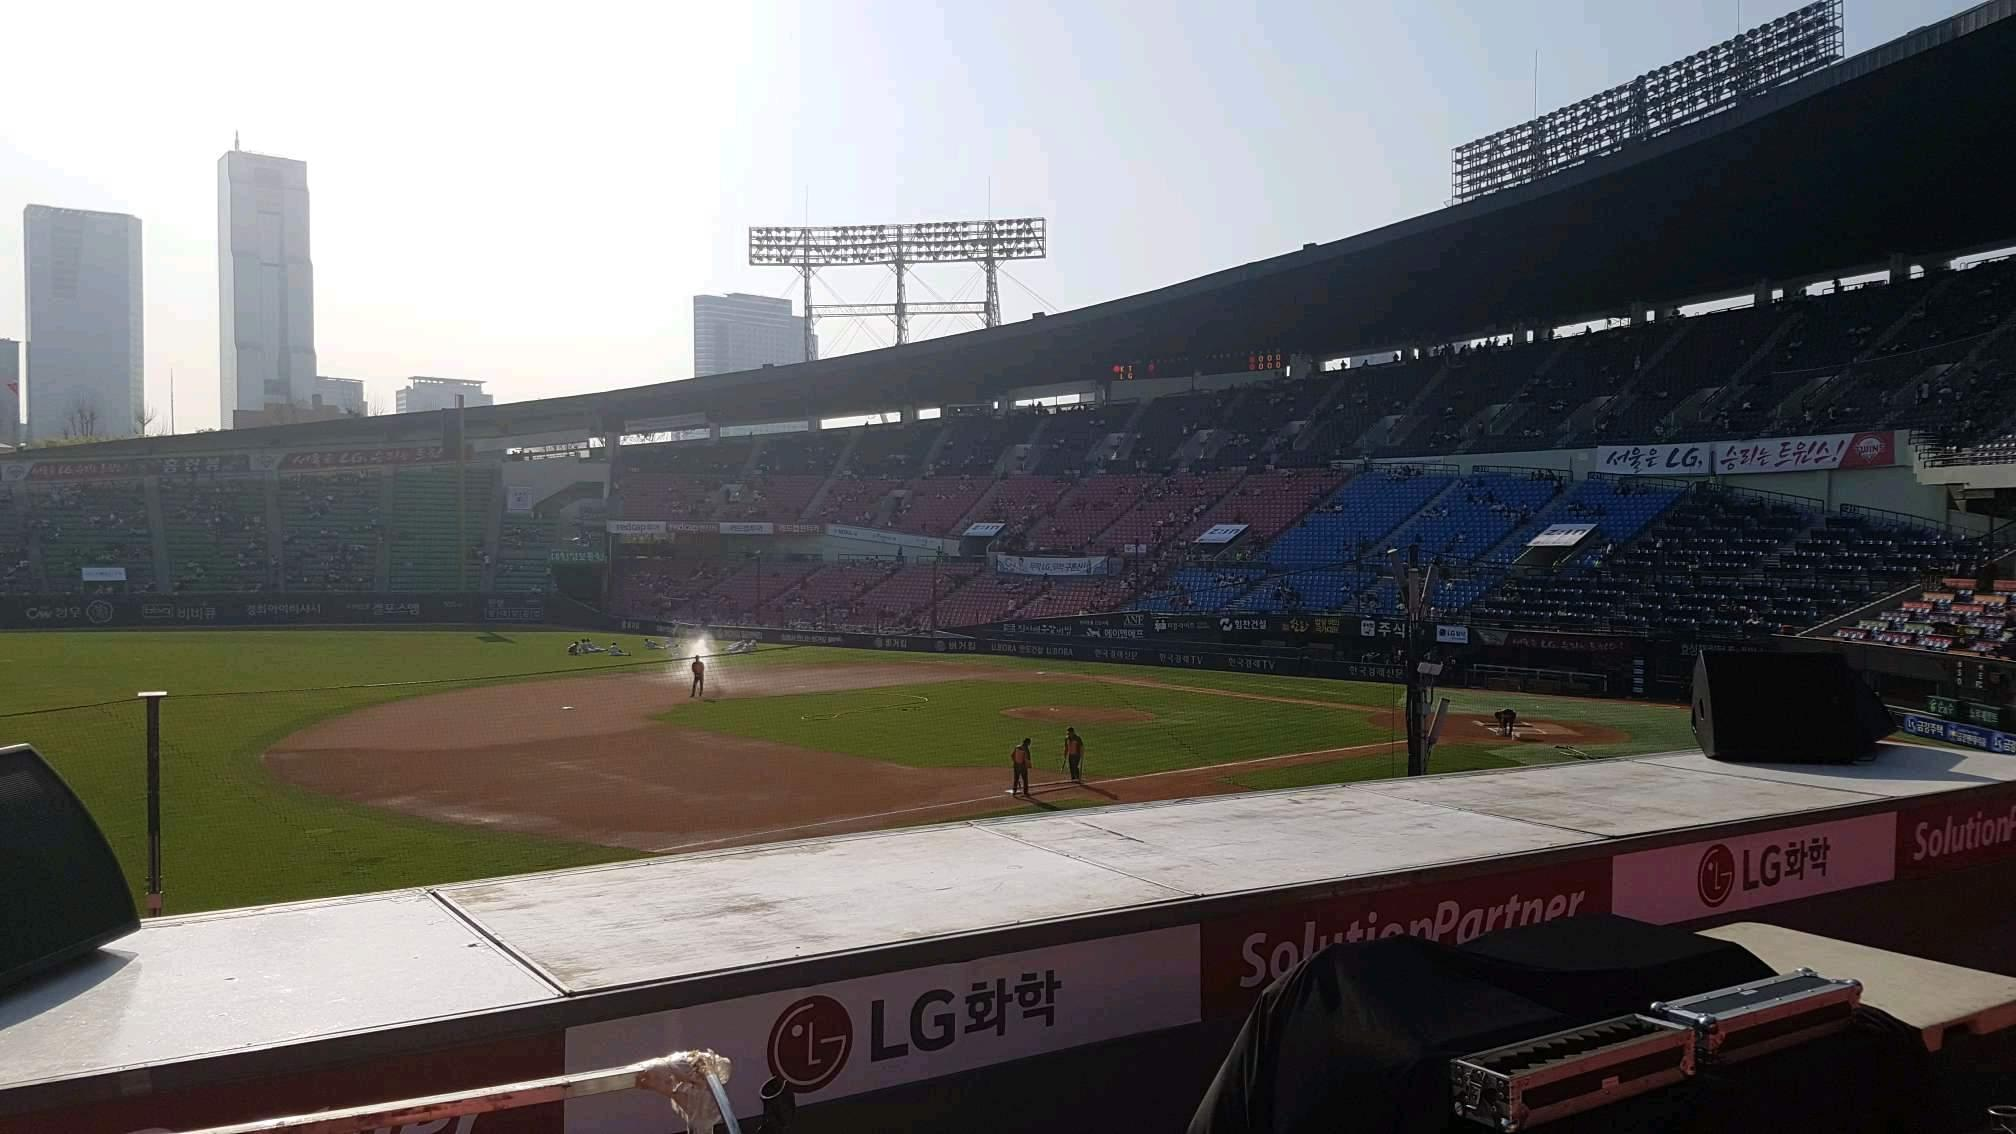 Jamsil Baseball Stadium Section 221 Row 3 Seat 22